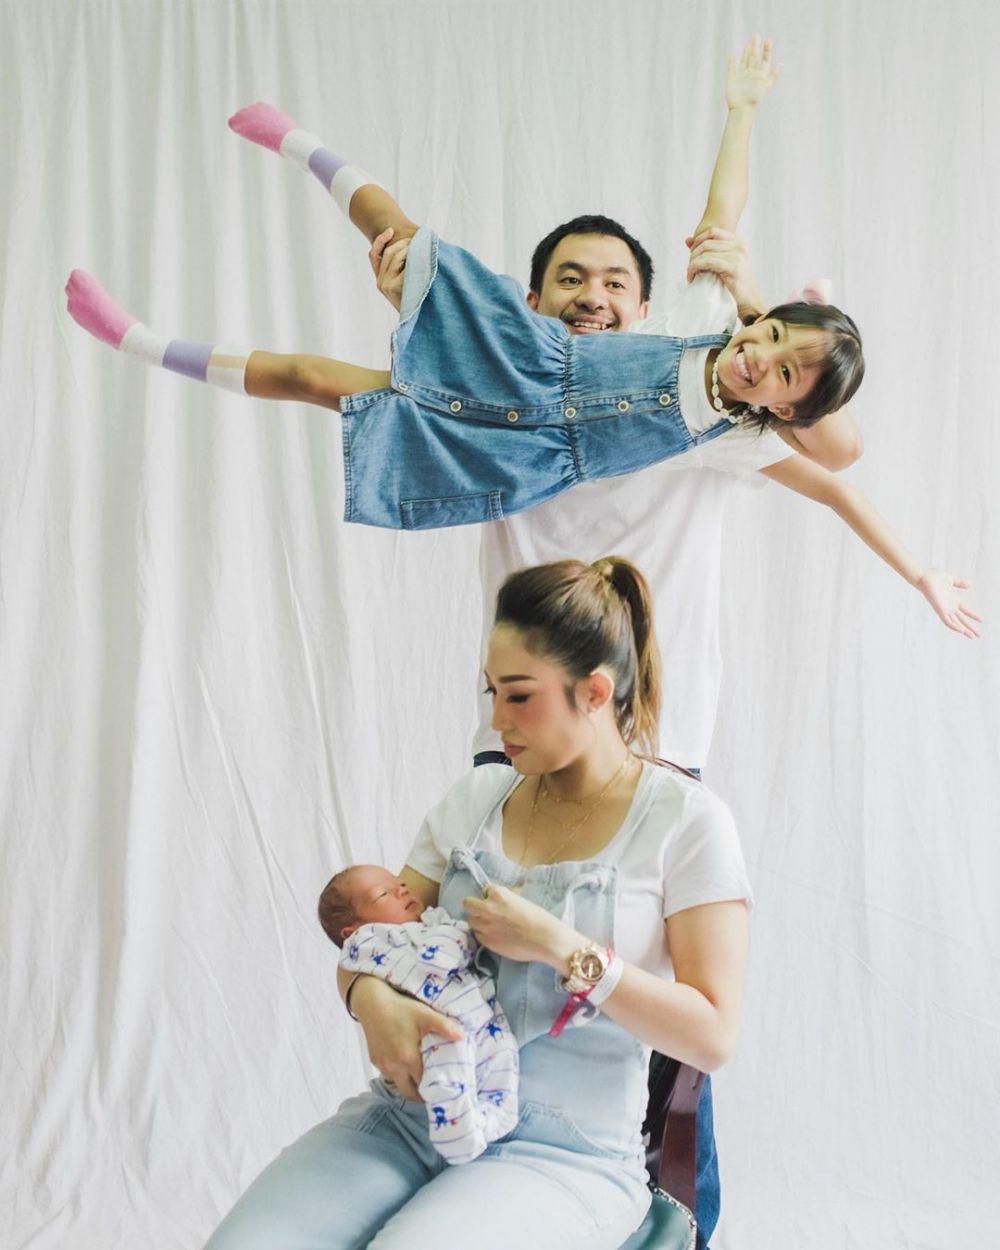 7 Momen manis Ayu Dewi bareng keluarga pasca melahirkan Instagram/@mrsayudewi